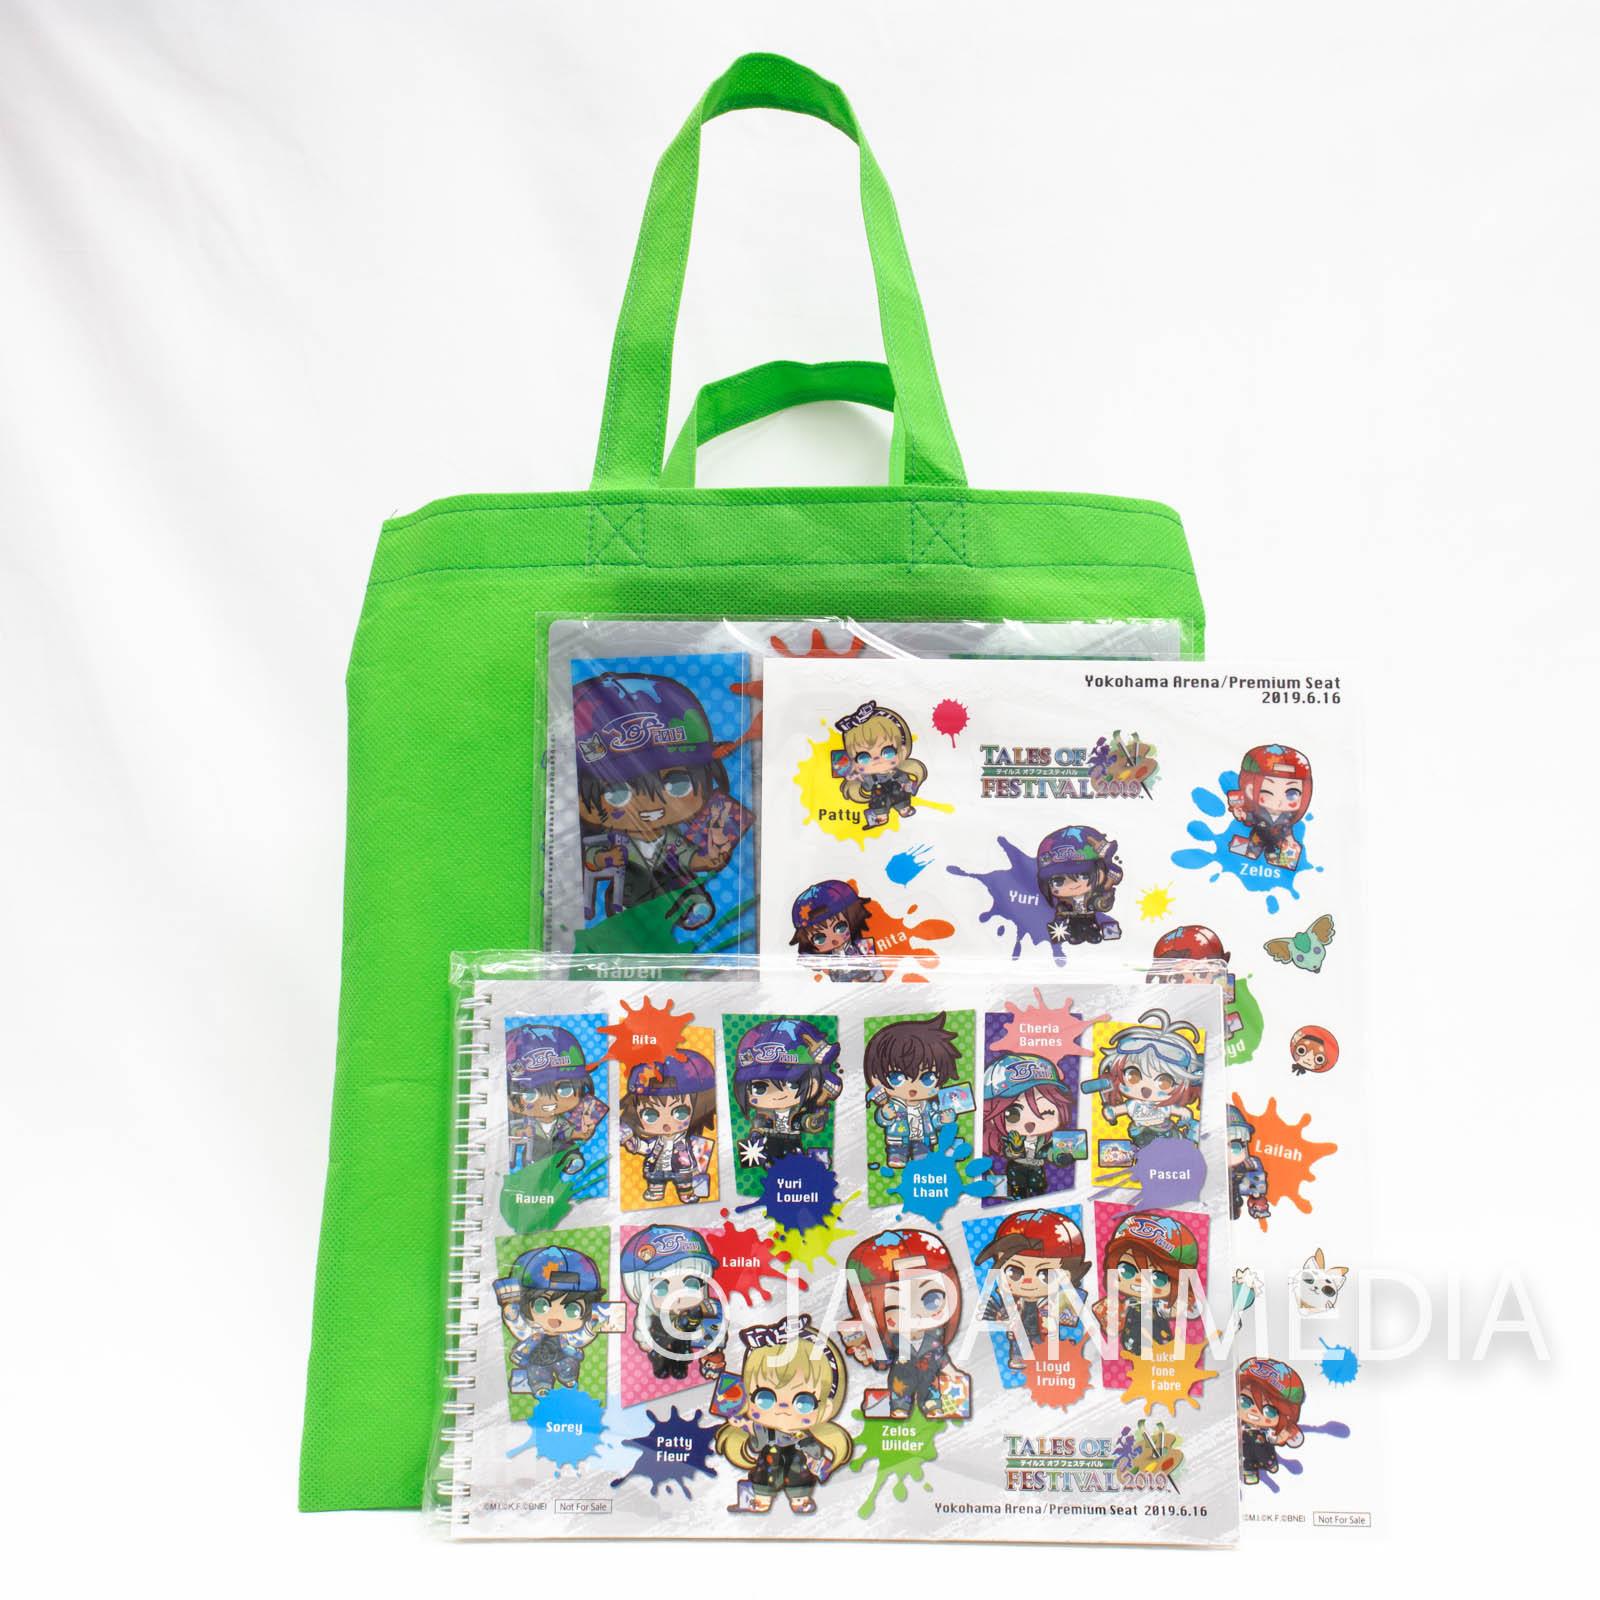 Tales of Festival 2019 Sketchbook & Clear File Folder & Sticker Sheet Set Yokohama Arena JAPAN GAME